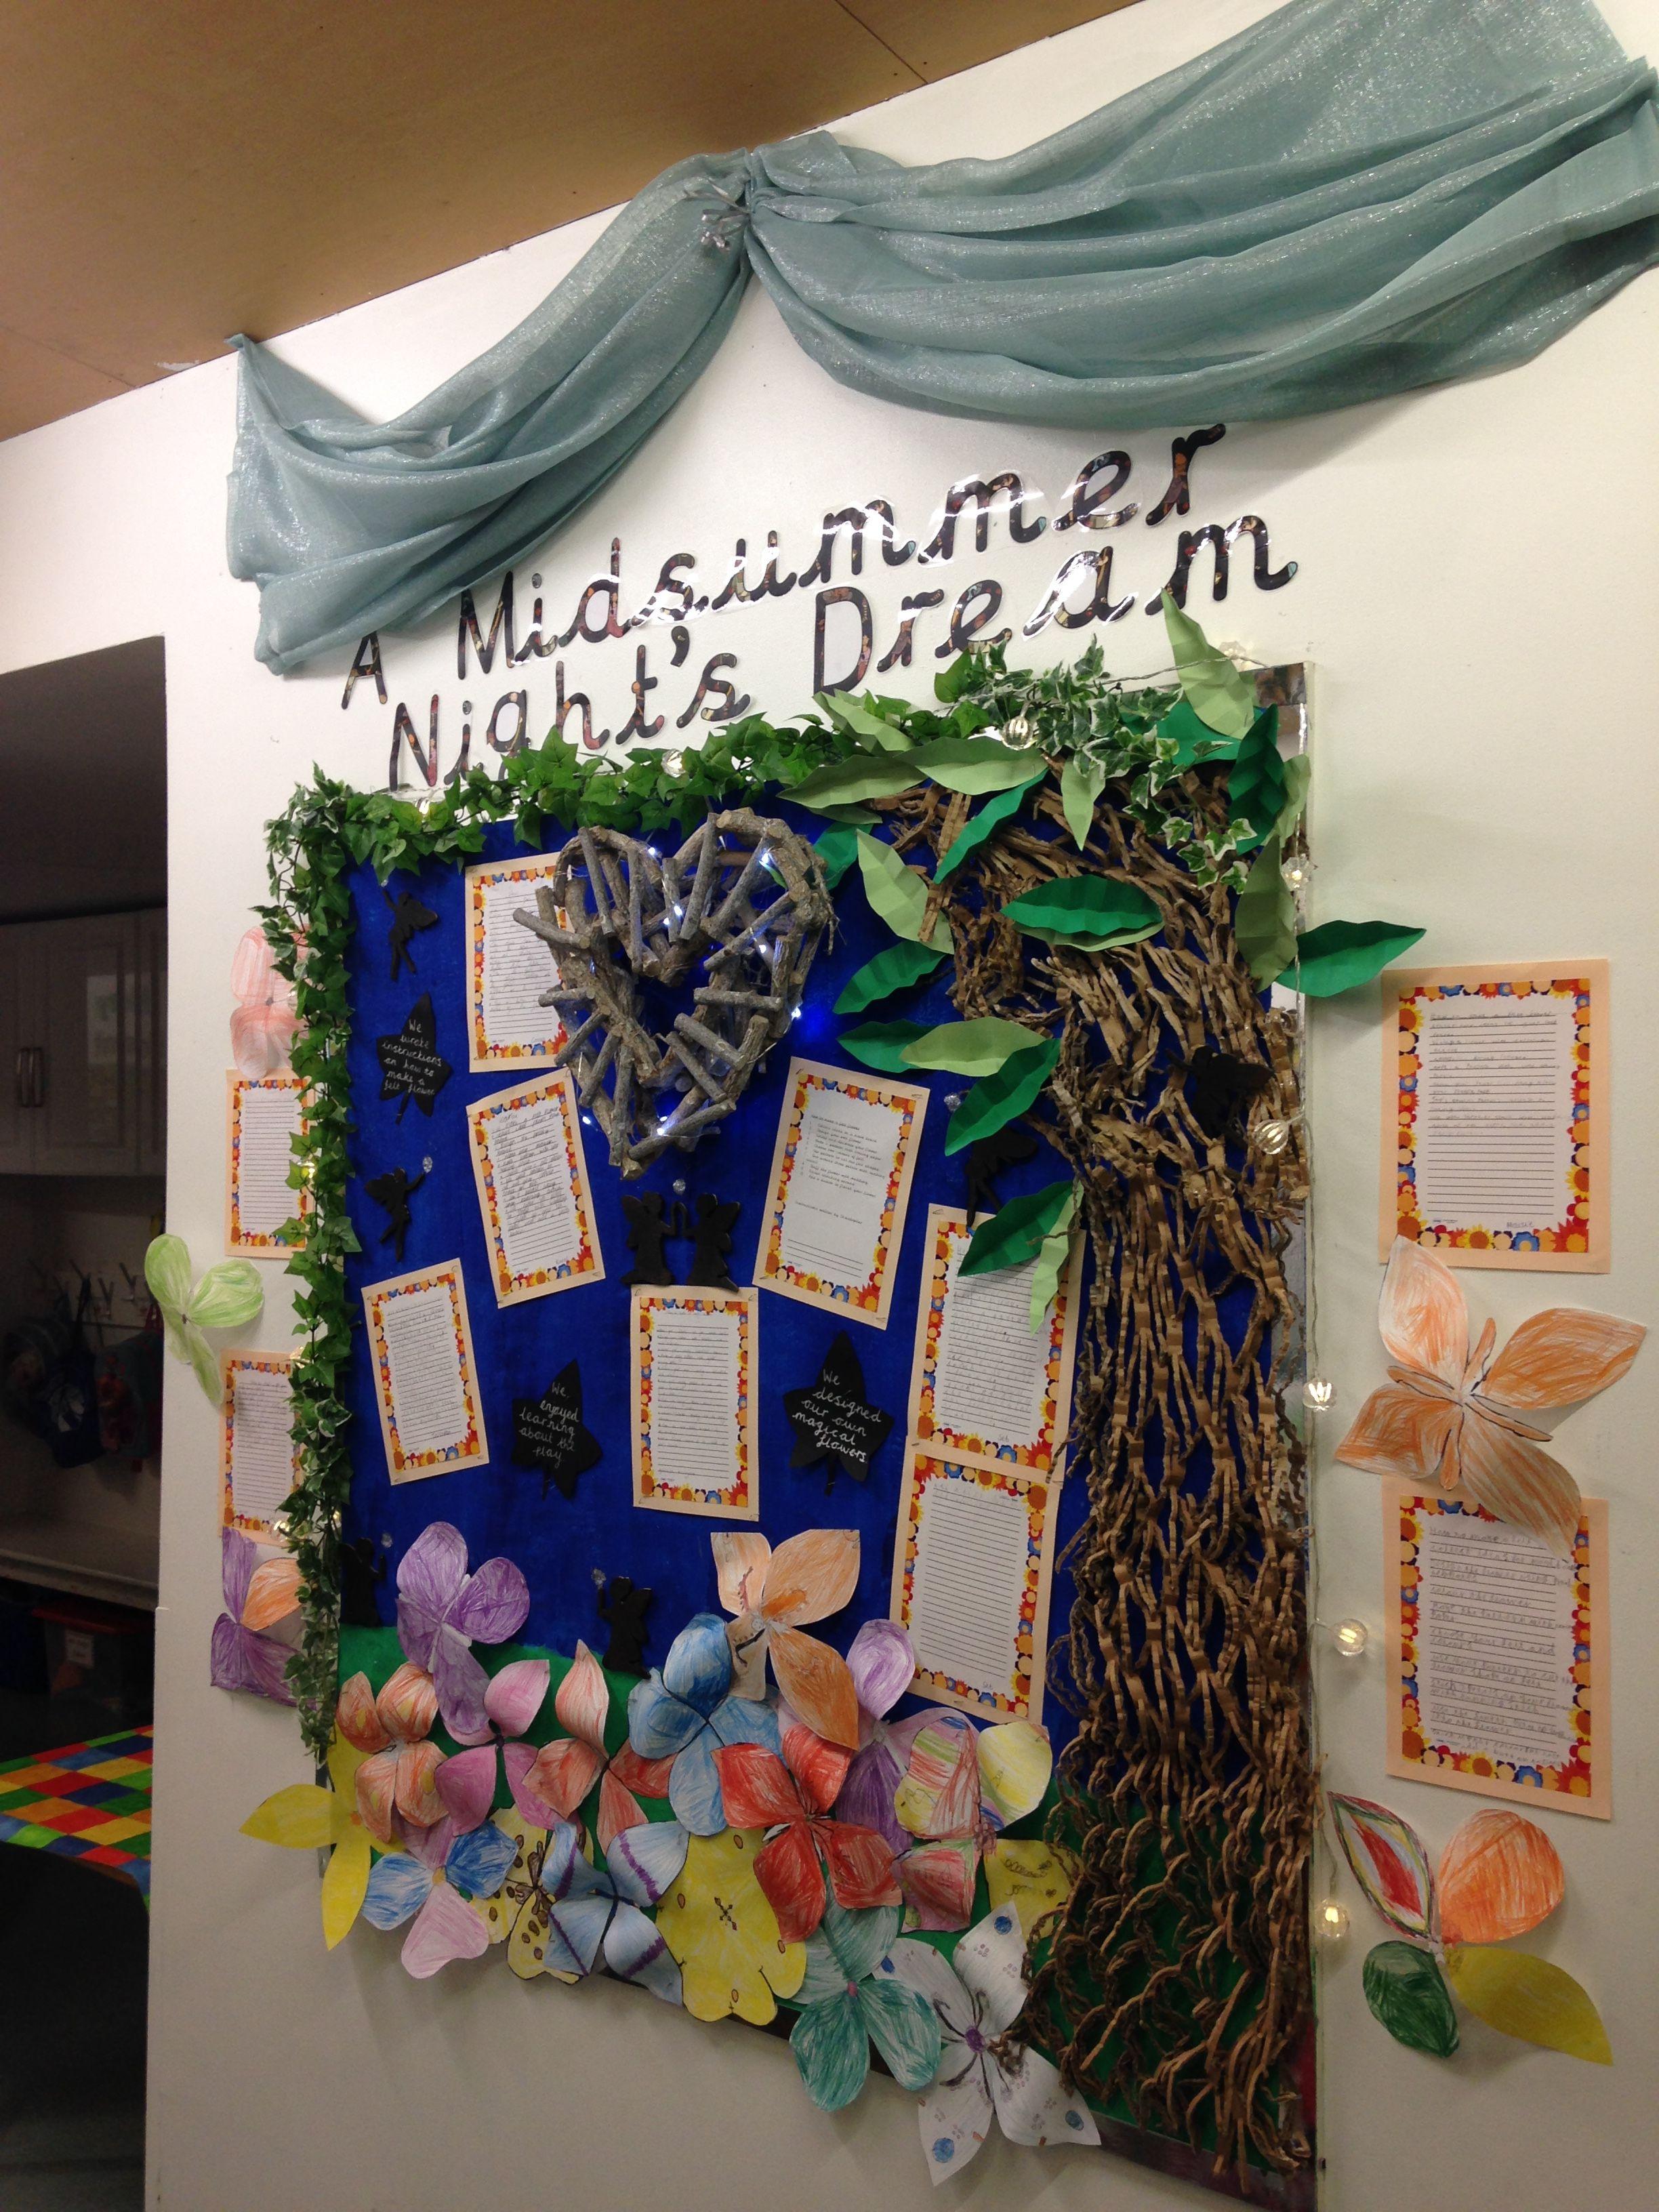 Shakespeare Display Ks1 Primary School A Midsummer Night